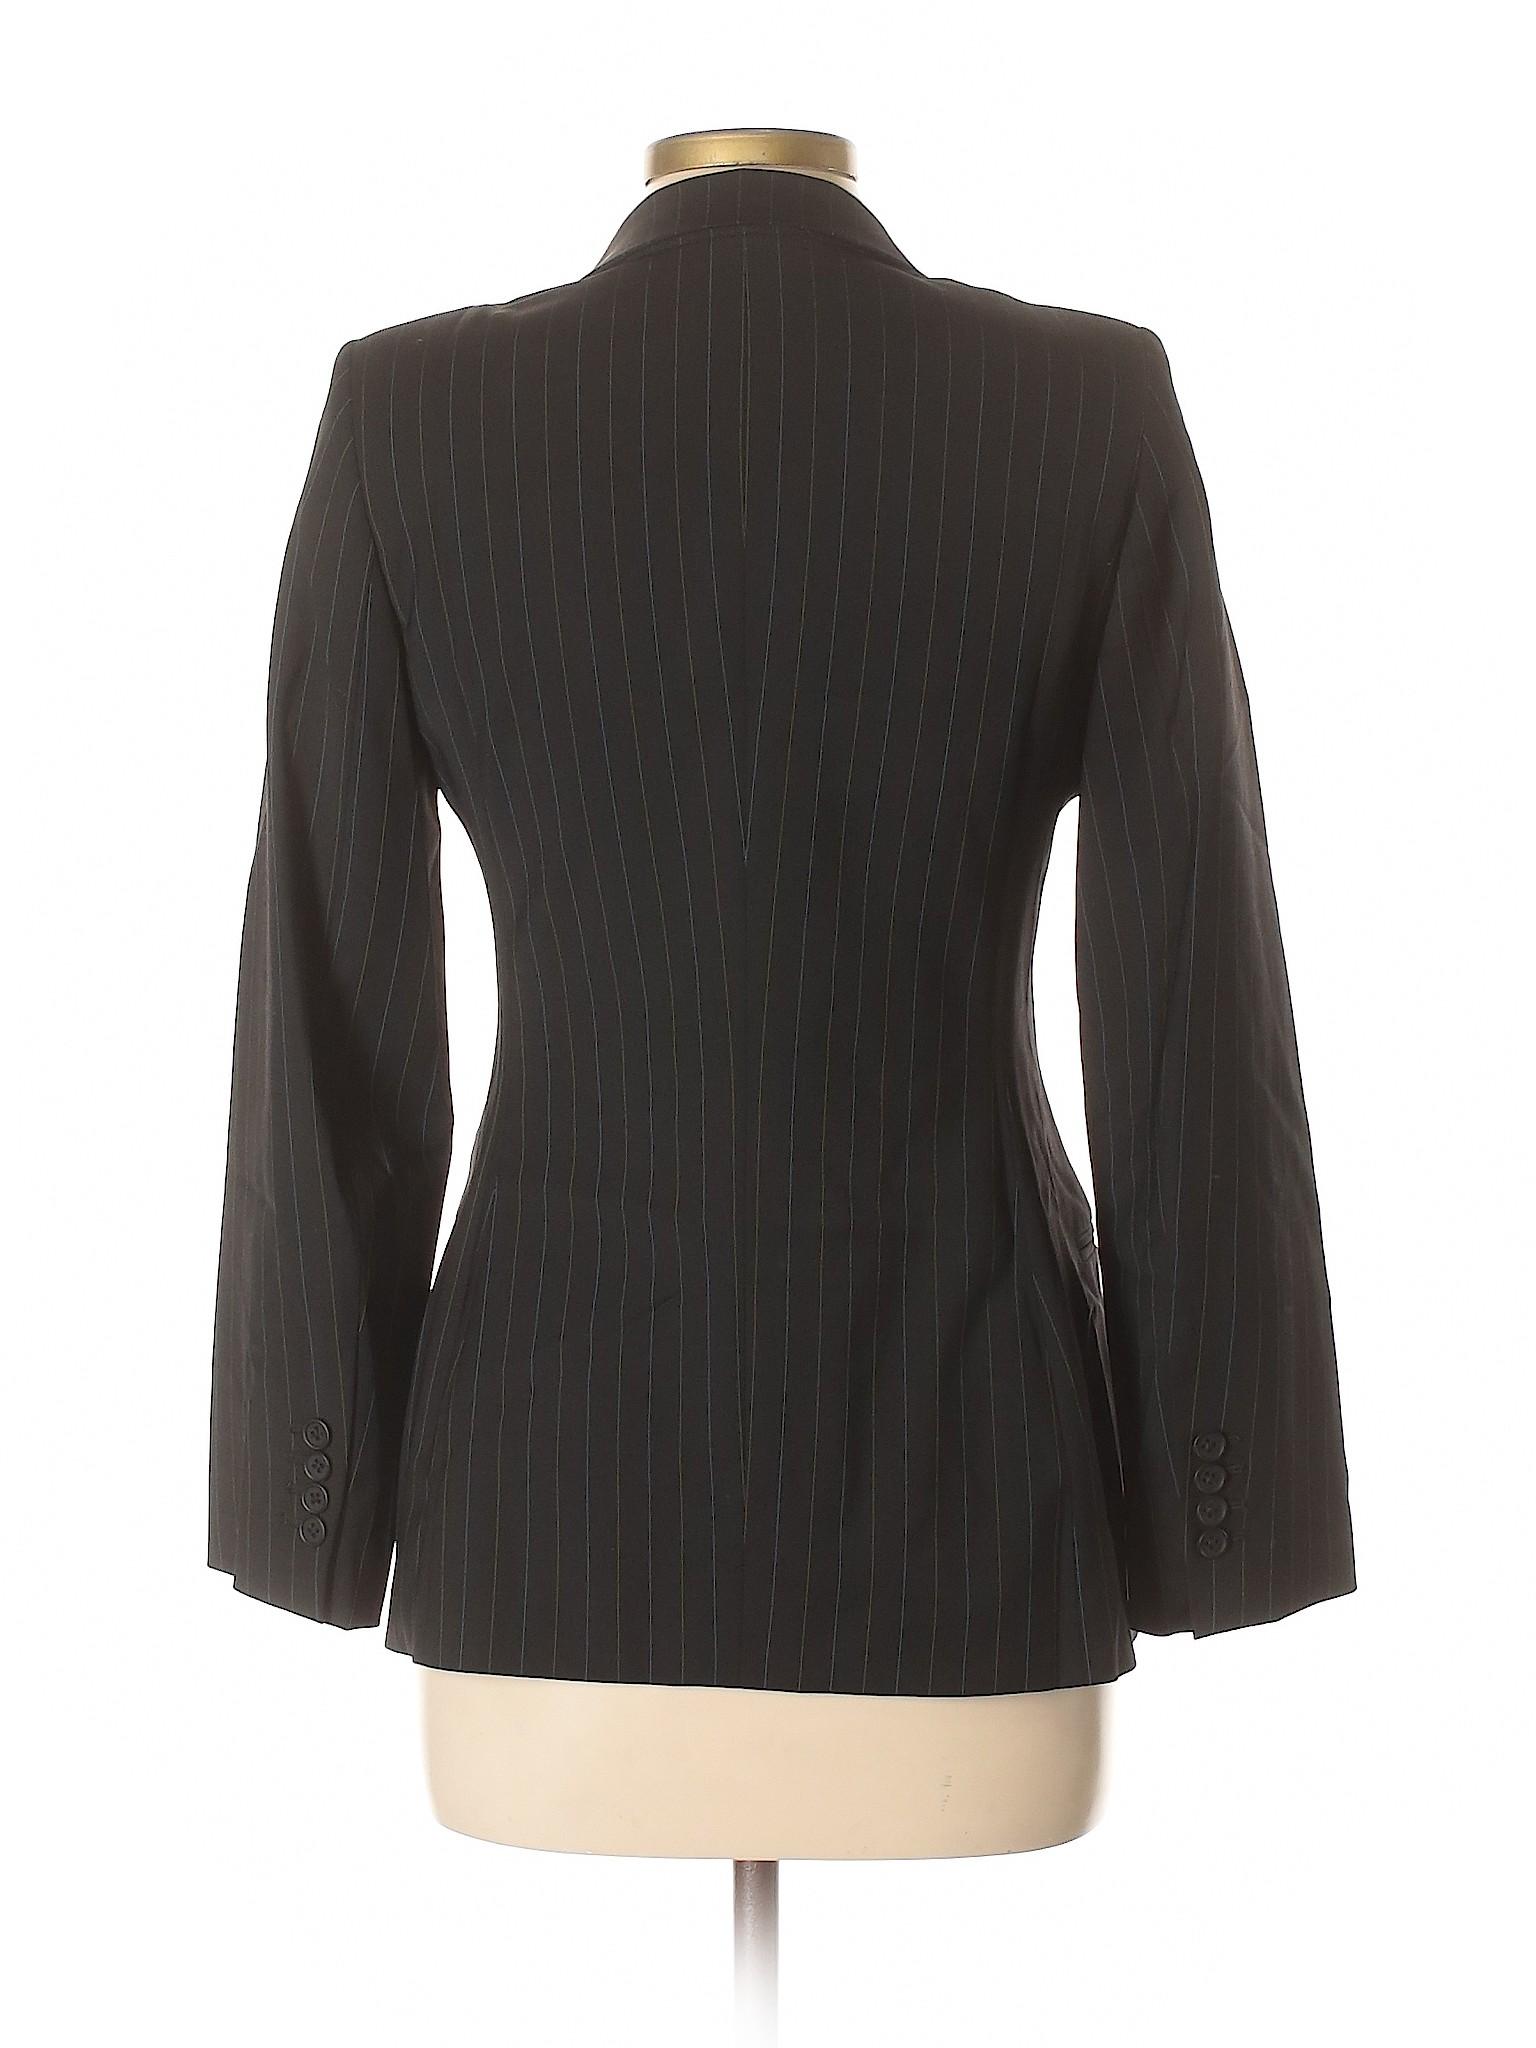 Boutique Sempione Blazer Wool Piazza leisure PPnqrxp